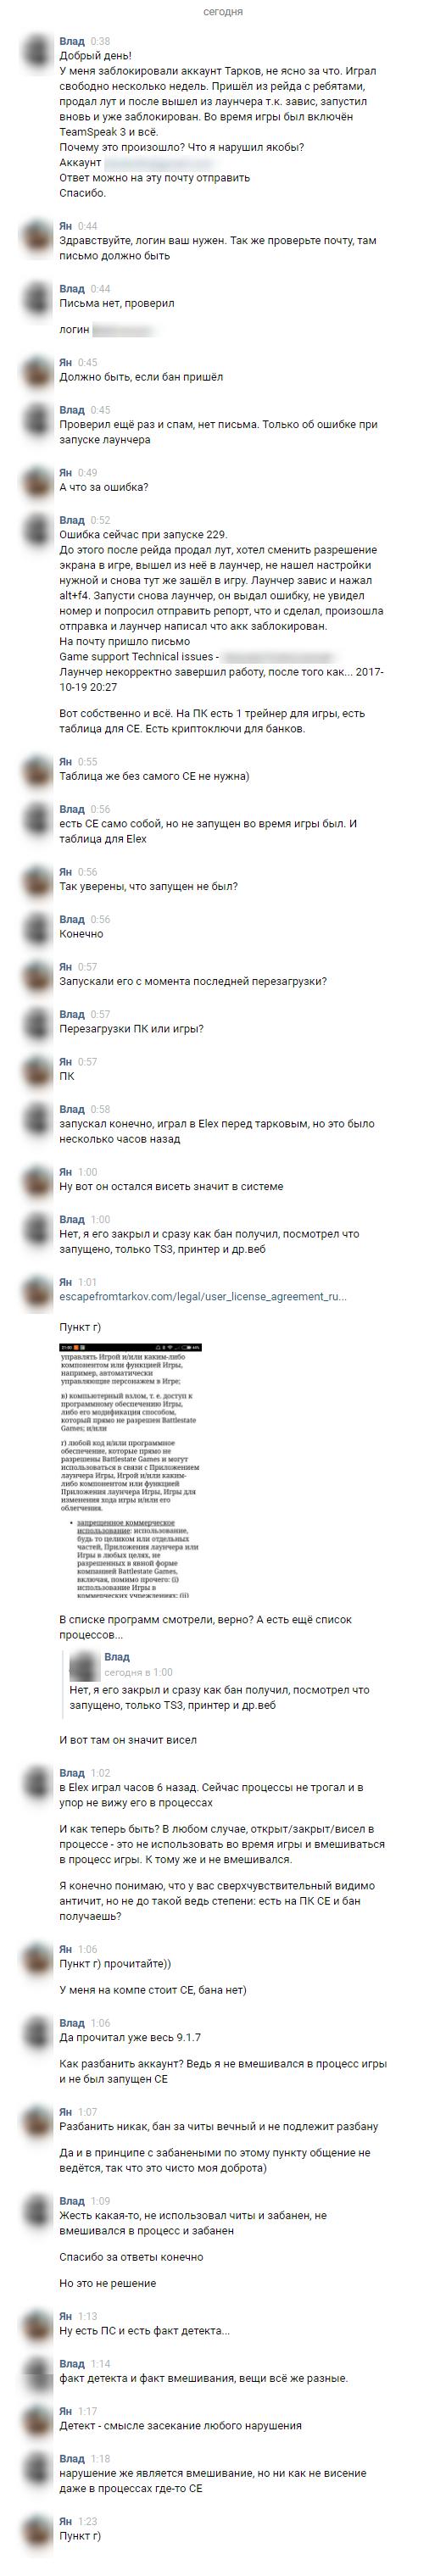 Бан Escape from Tarkov за хранение на ПК Cheat Engine Видеоигра, Бан, Несправедливость, Длиннопост, Длиннотекст, Escape from Tarkov